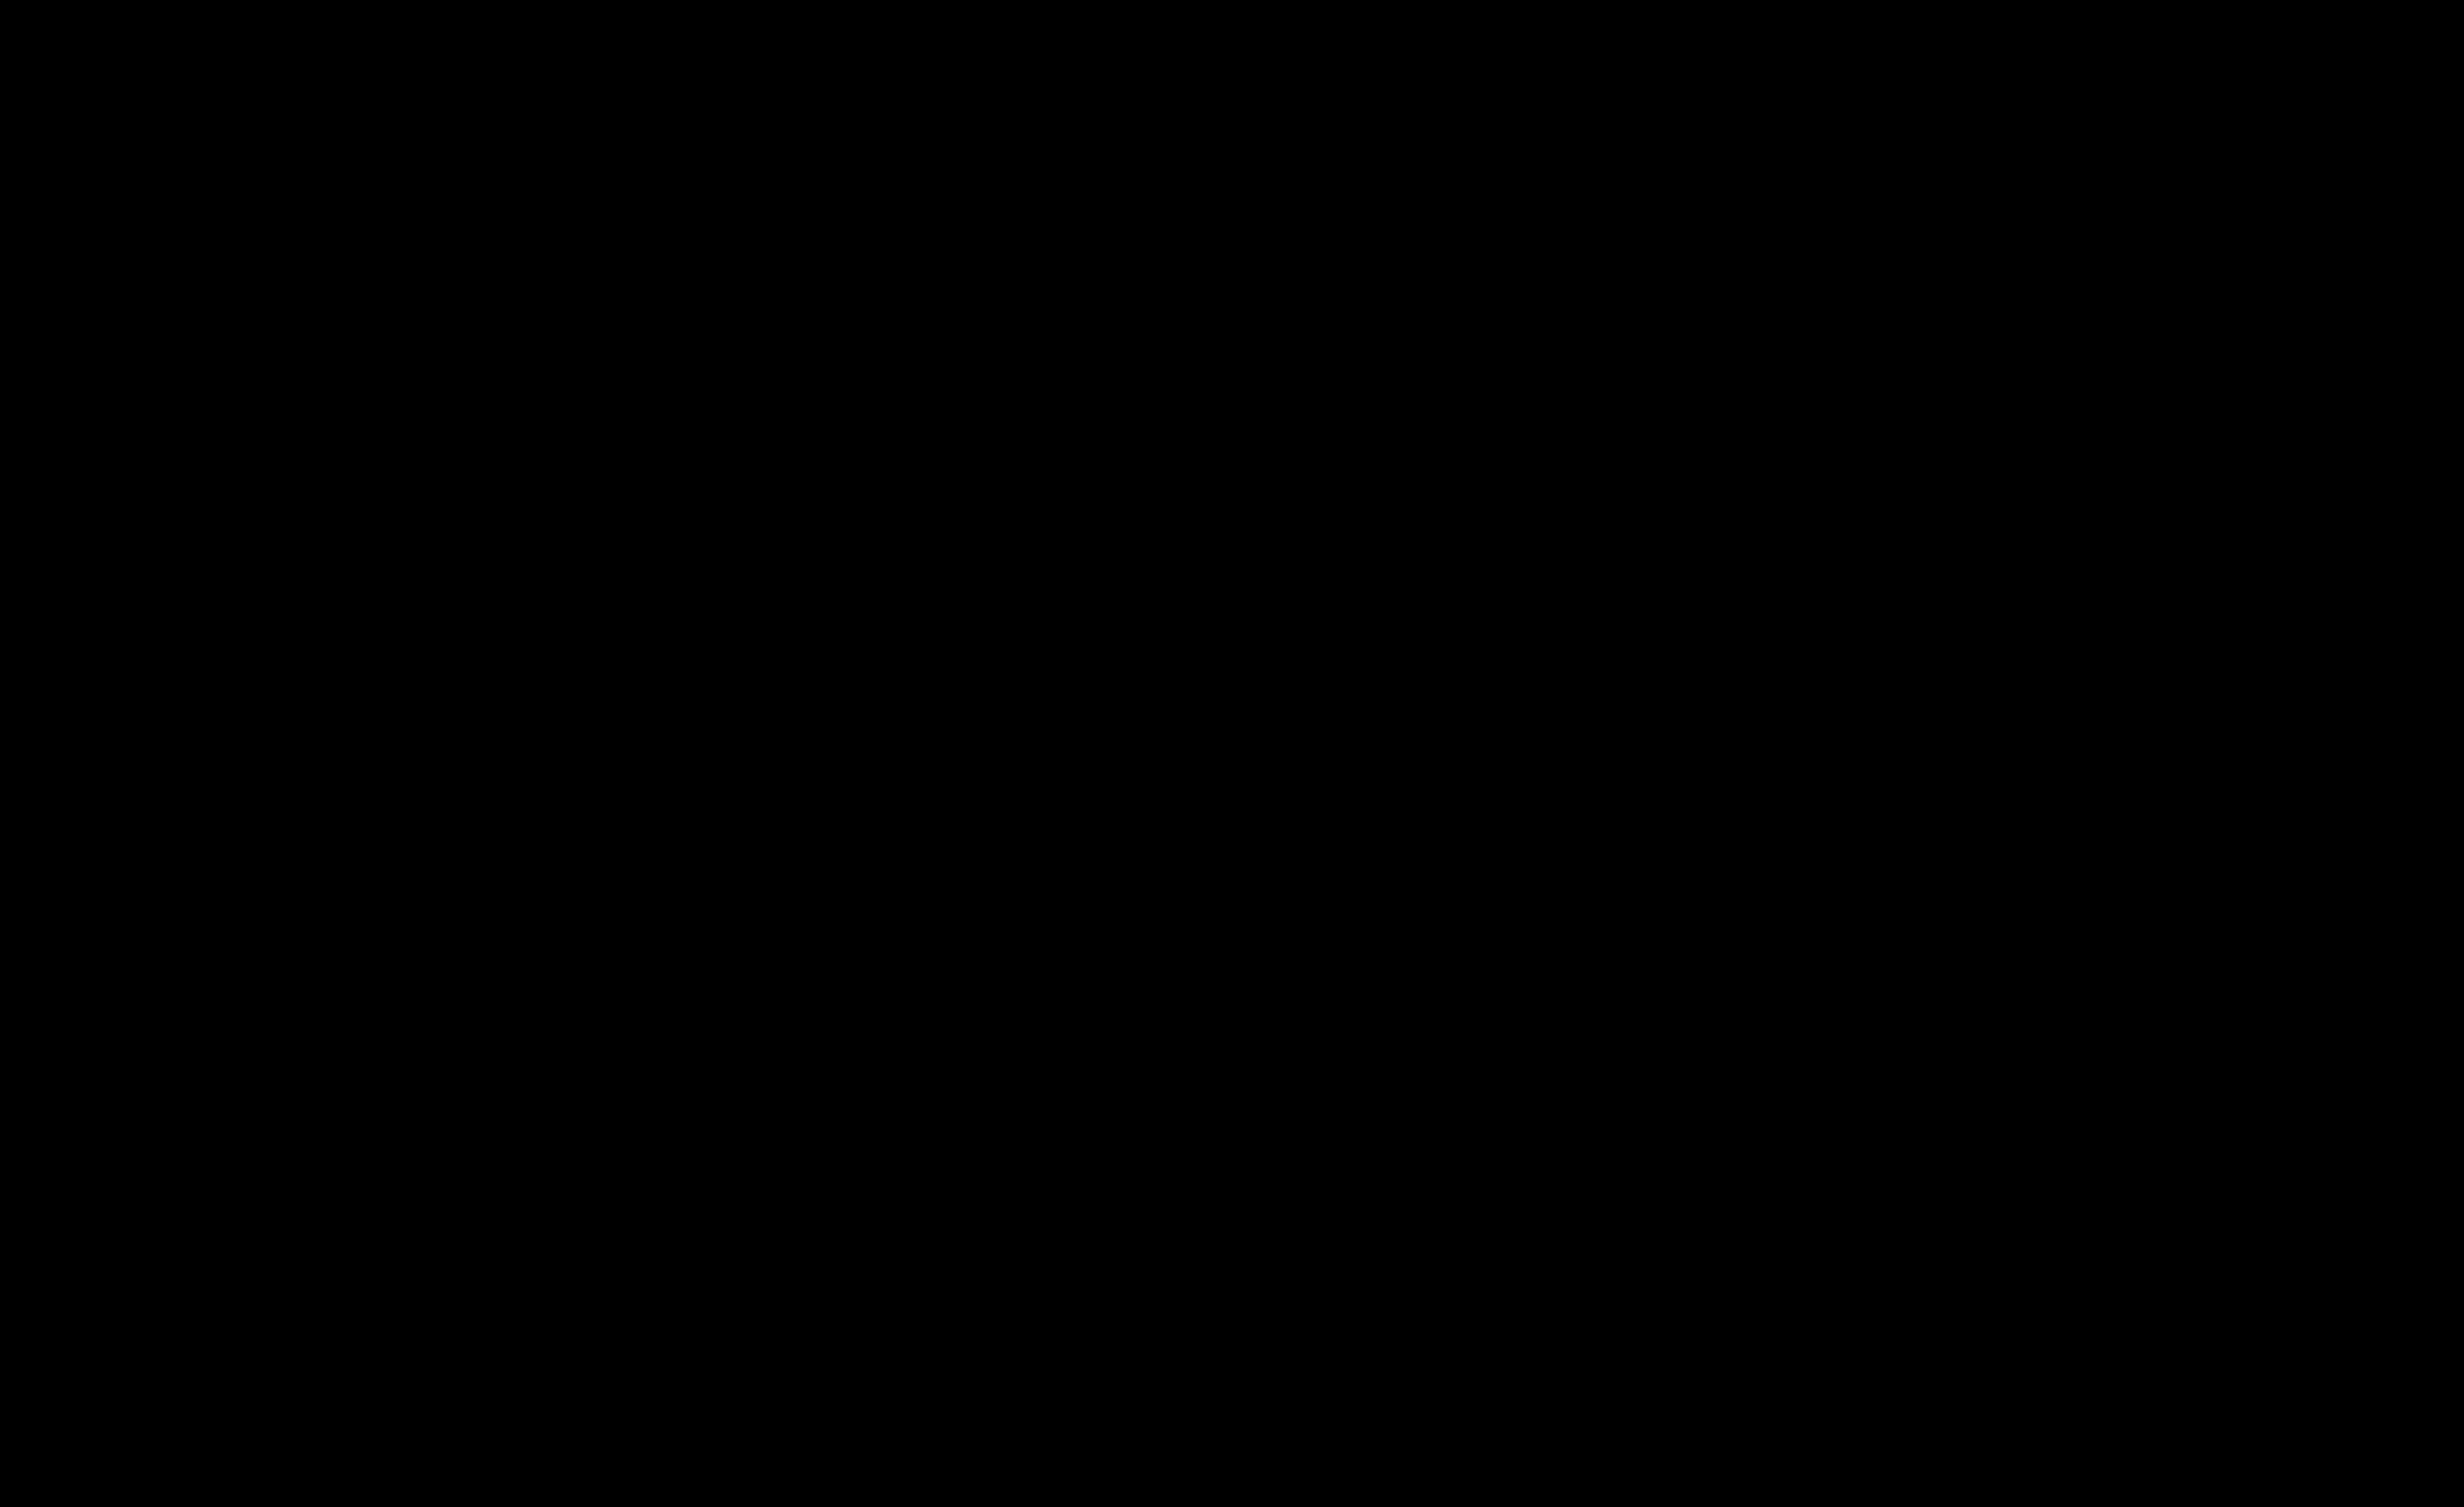 5316x3252 Music Notes Symbols Clip Art Free Clipart Images